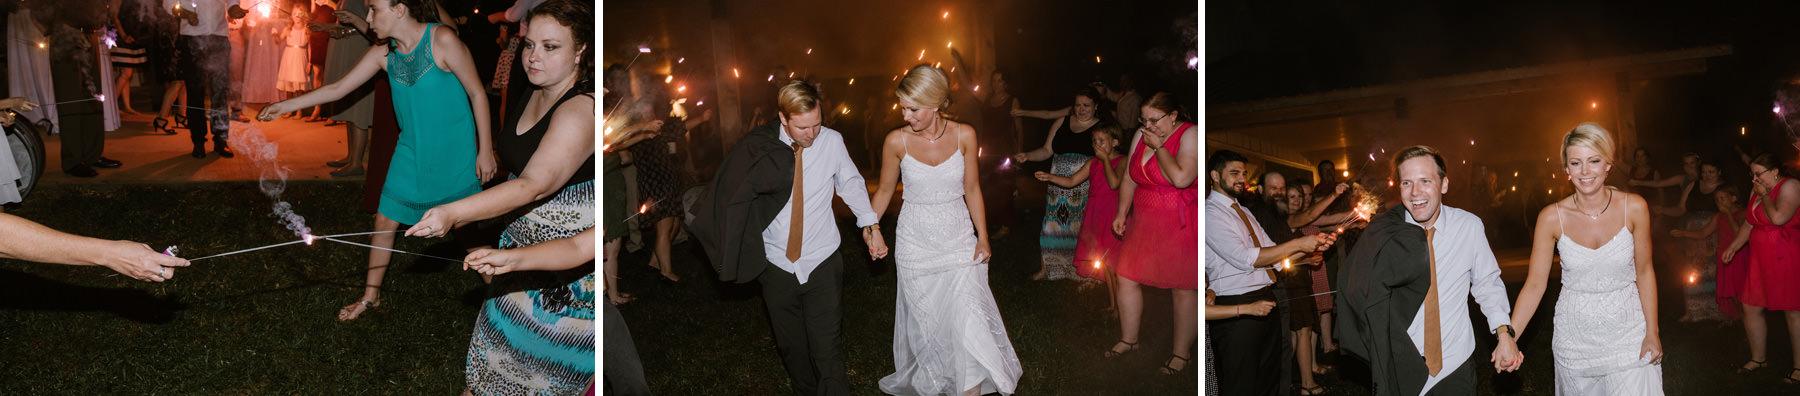 Alldredge Orchard Kansas City_Kindling Wedding Photography BLOG 94.JPG